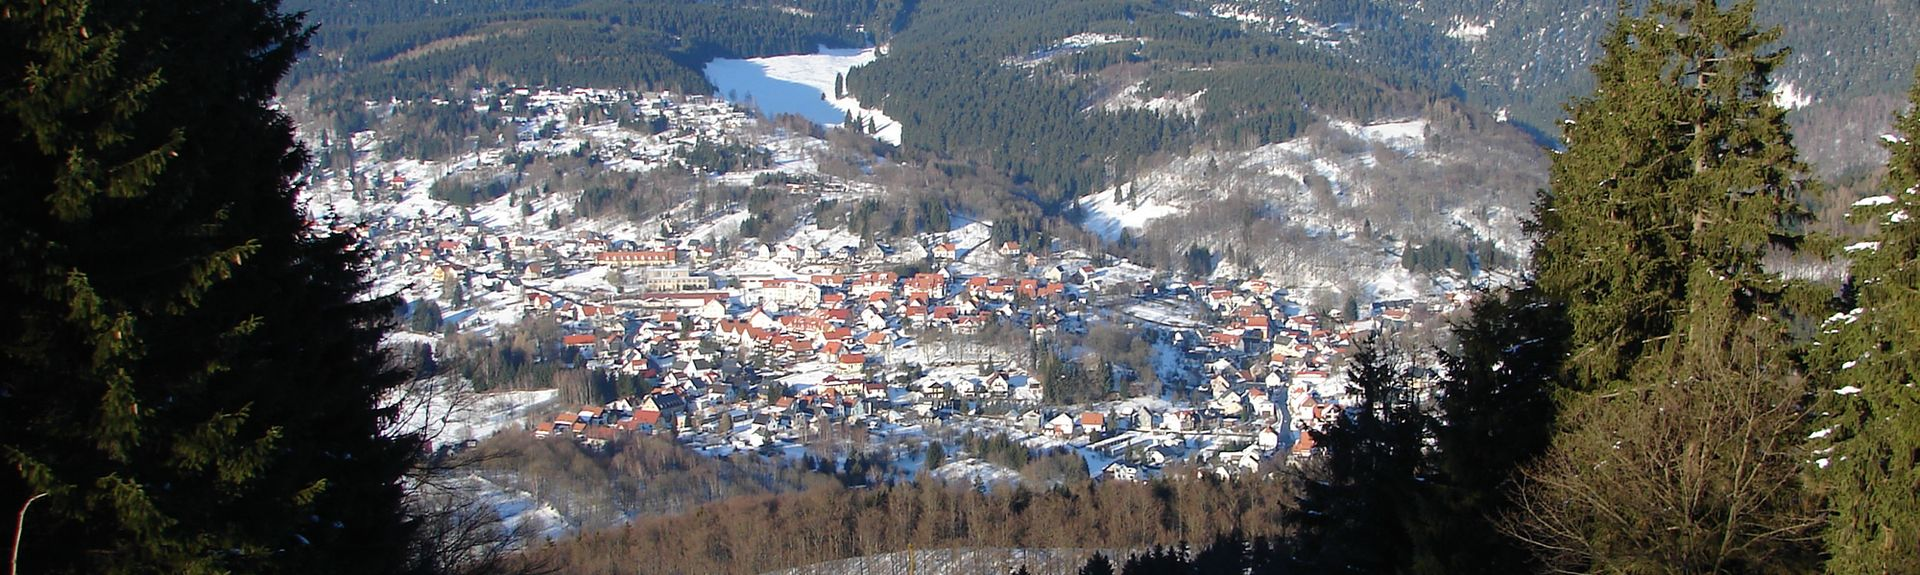 Suhl, Thuringia, Germany